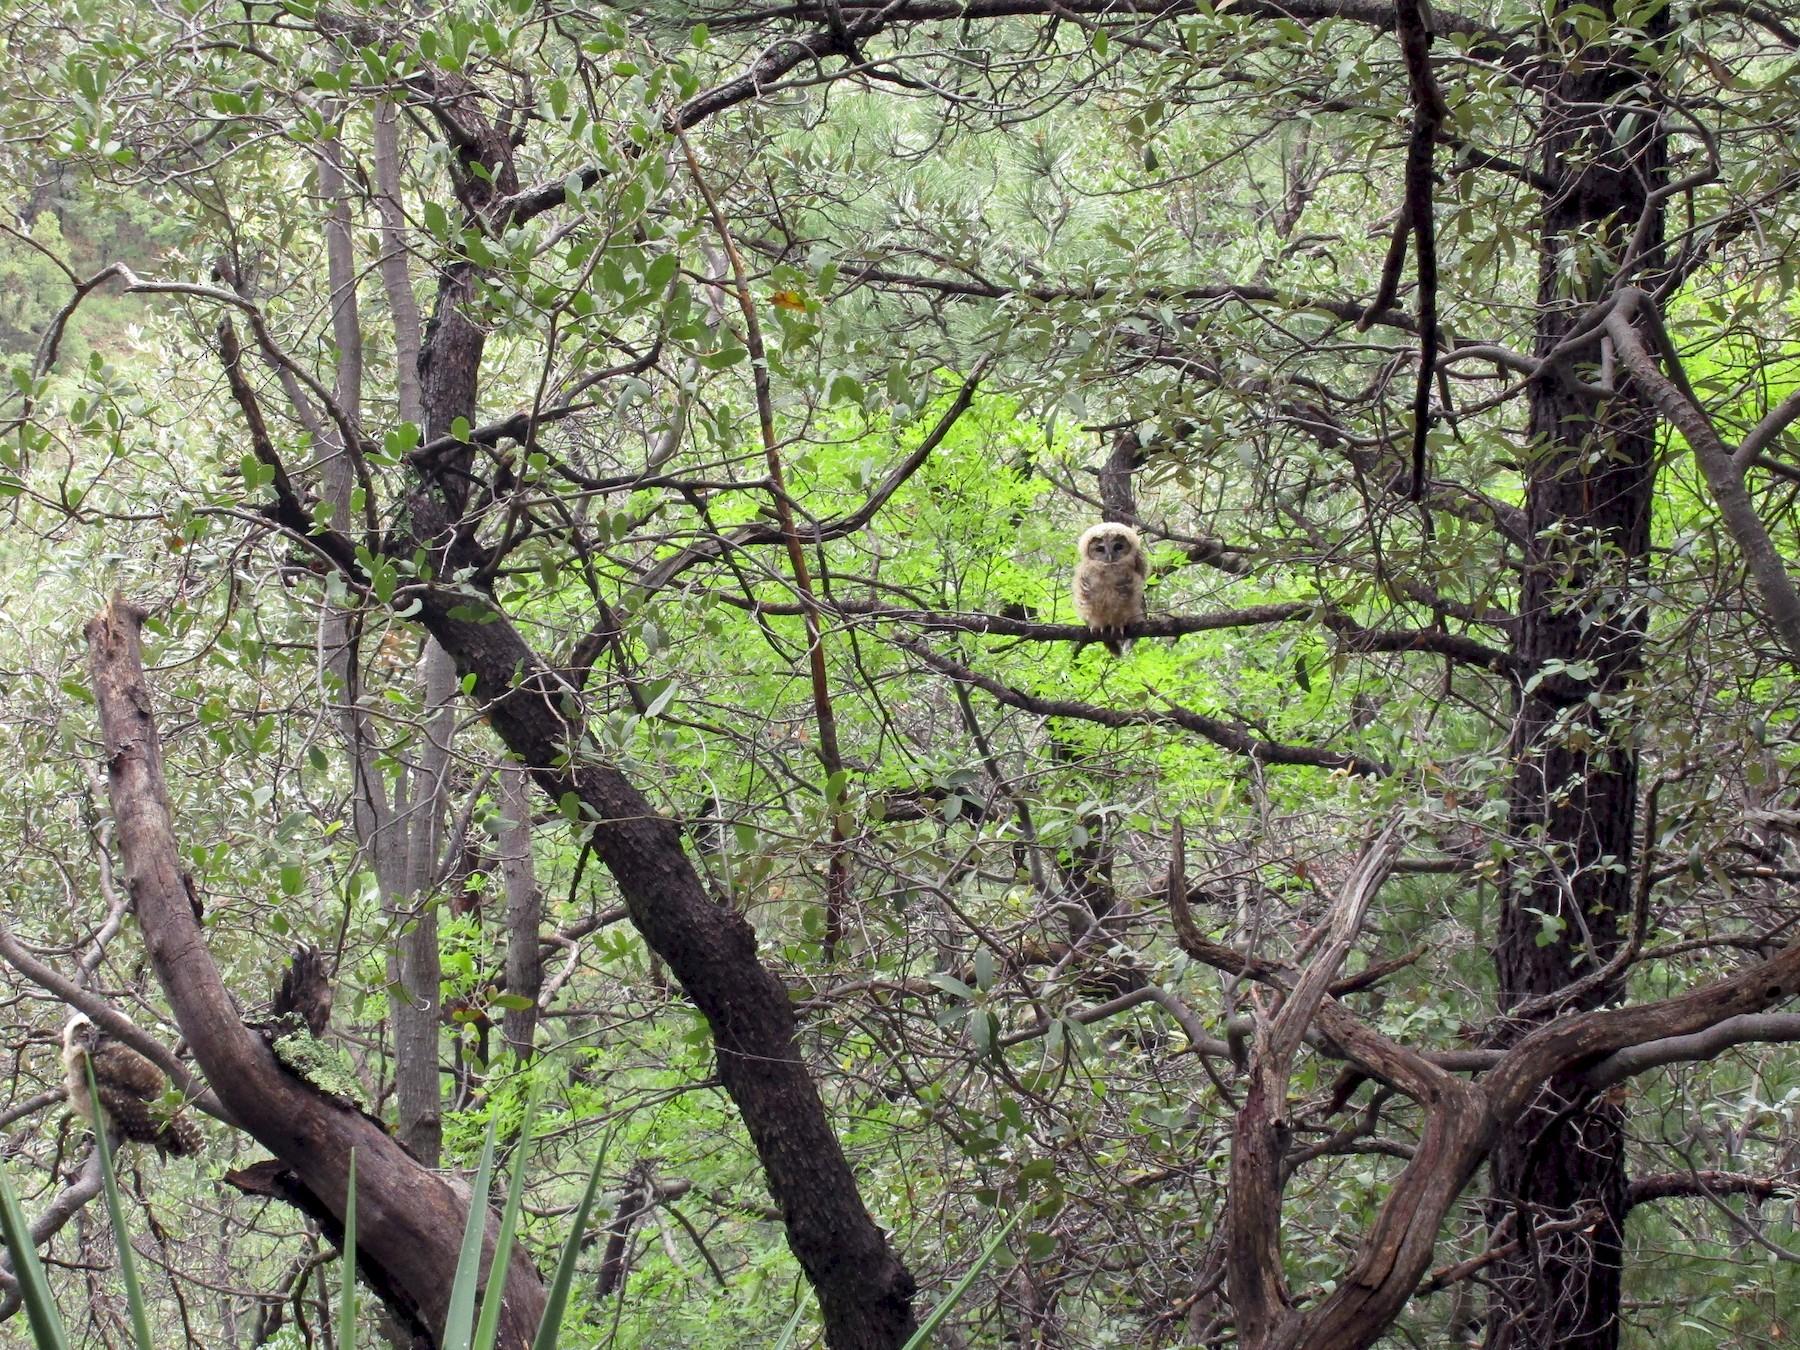 Spotted Owl - Mark Dorriesfield